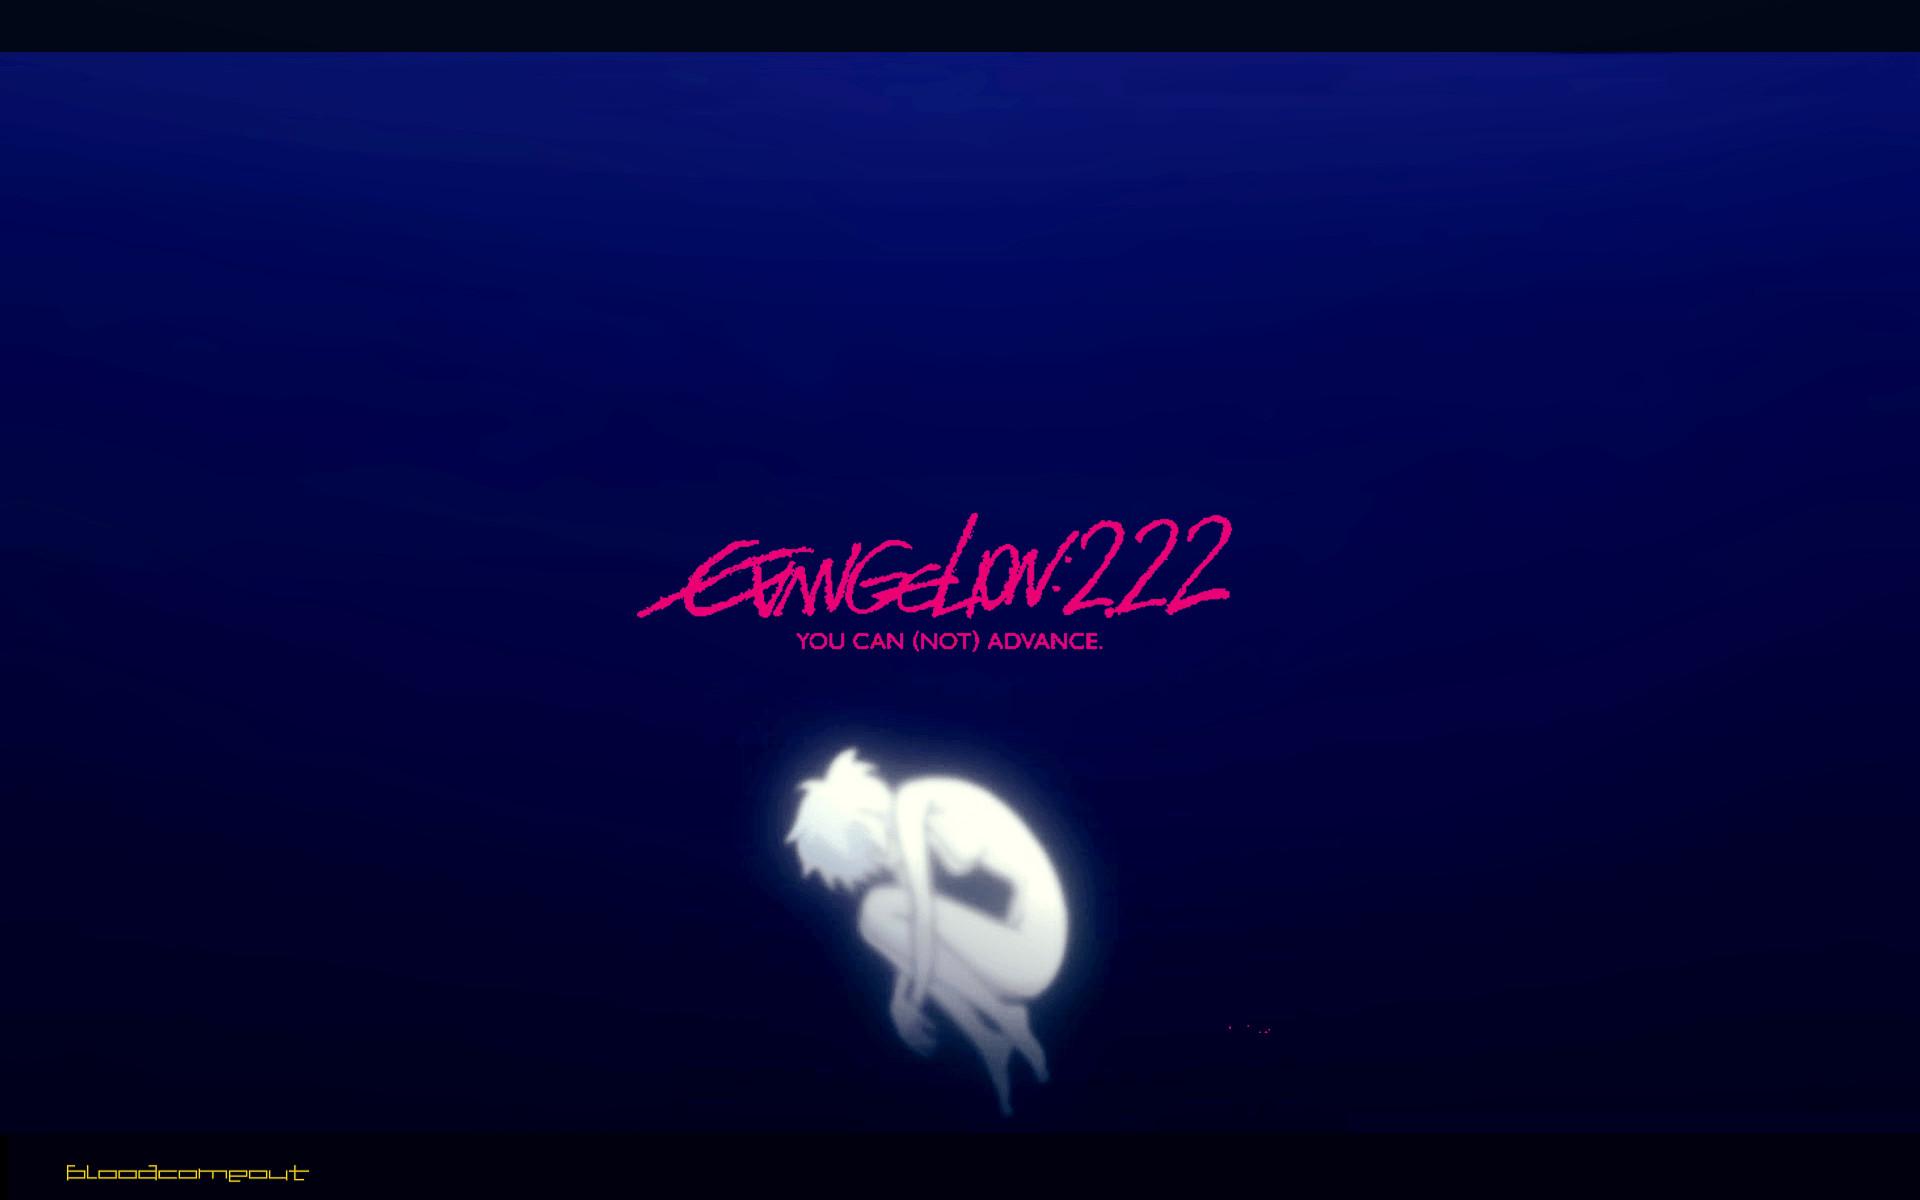 Evangelion 222 Wallpaper 68 Pictures